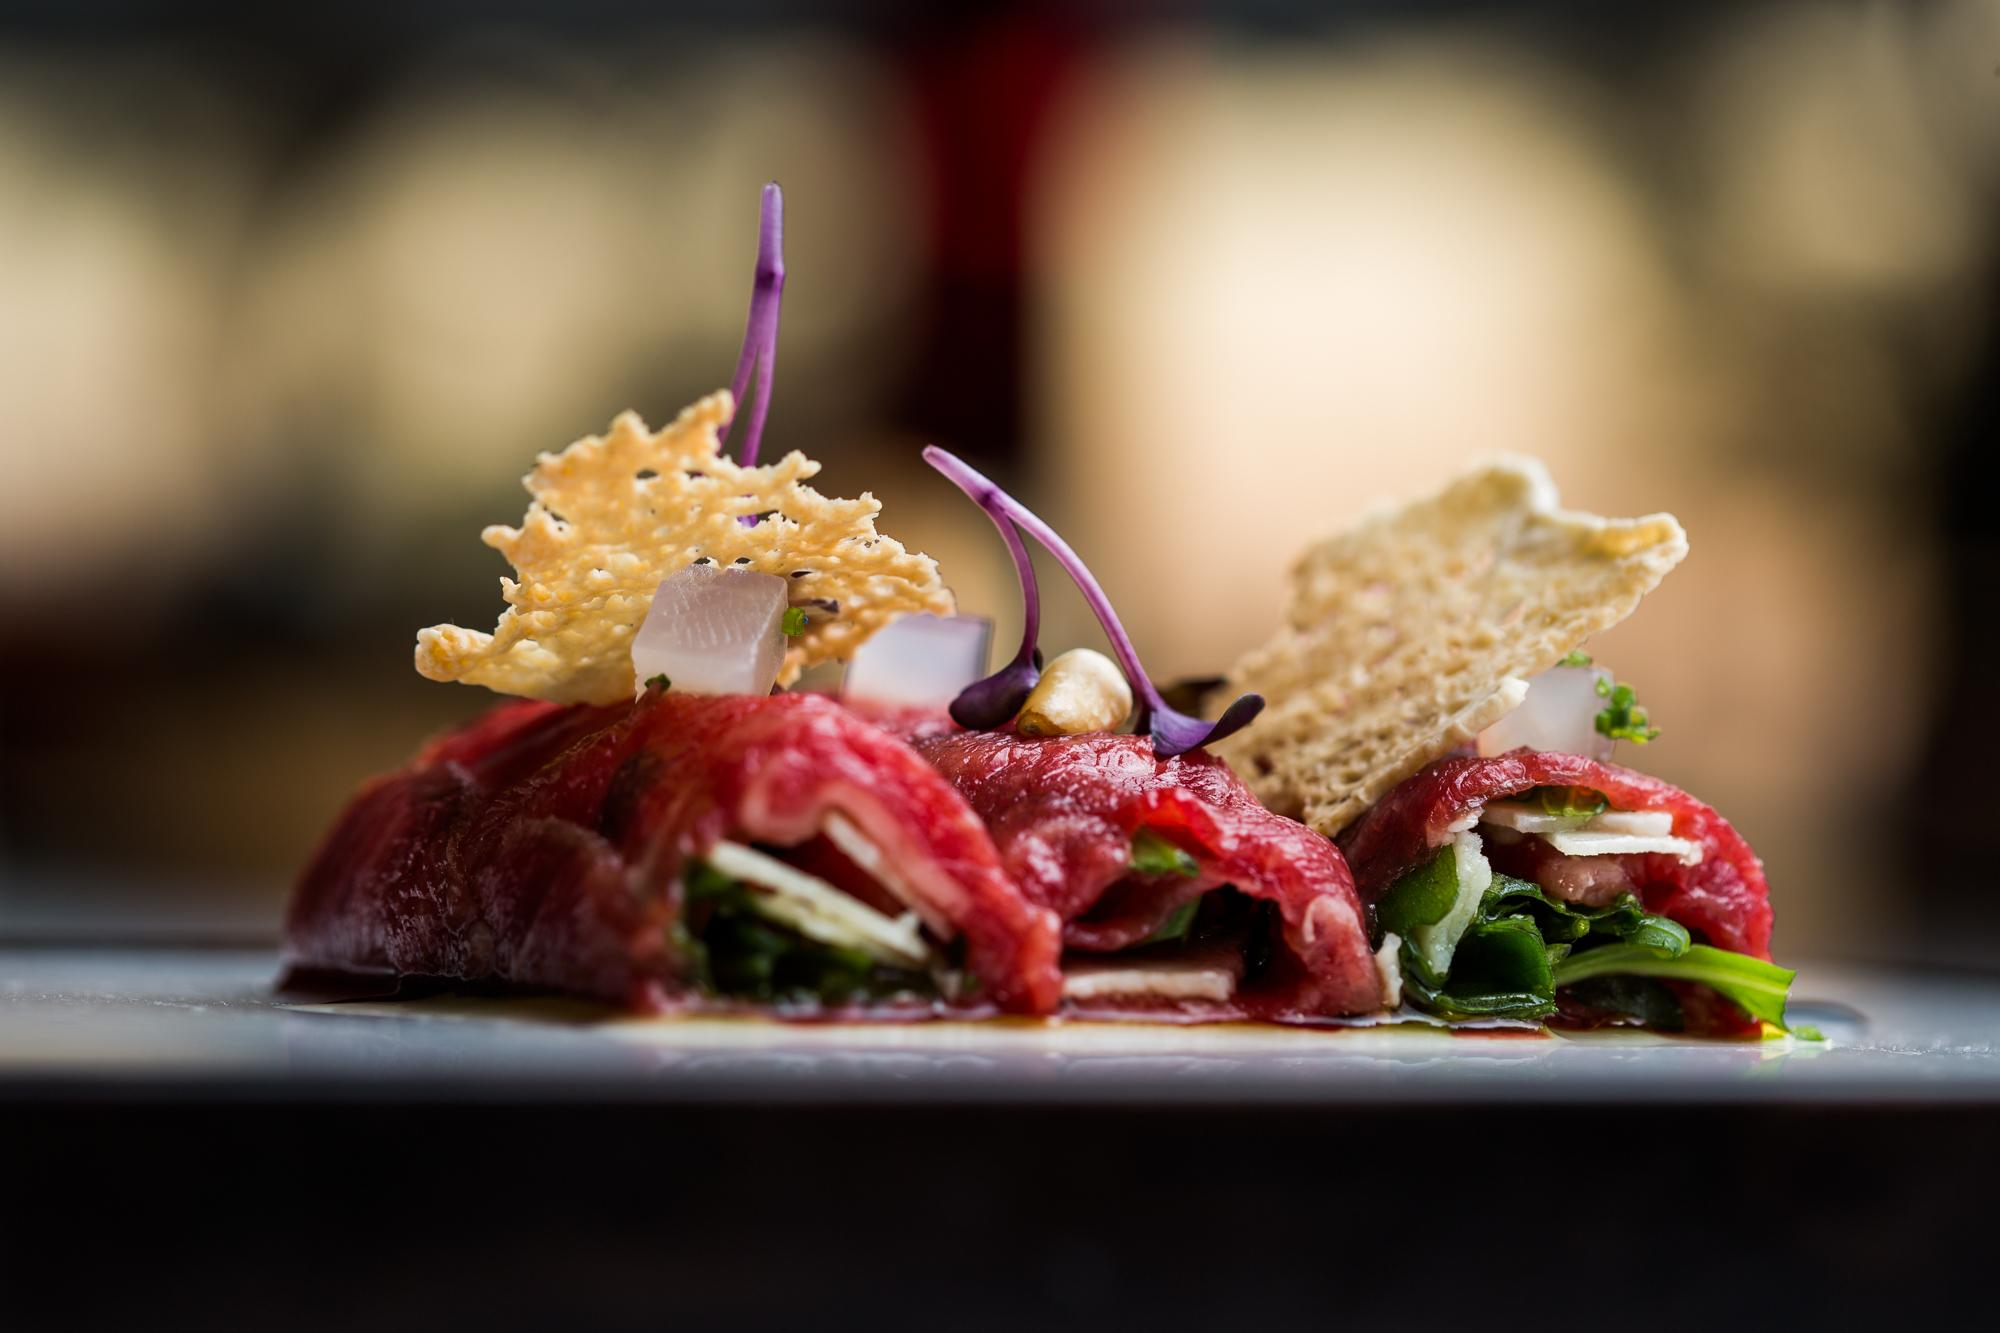 restaurante_la_aquarela_carlosglez_fotografo_las_palmas_gran_canaria_-33.jpg